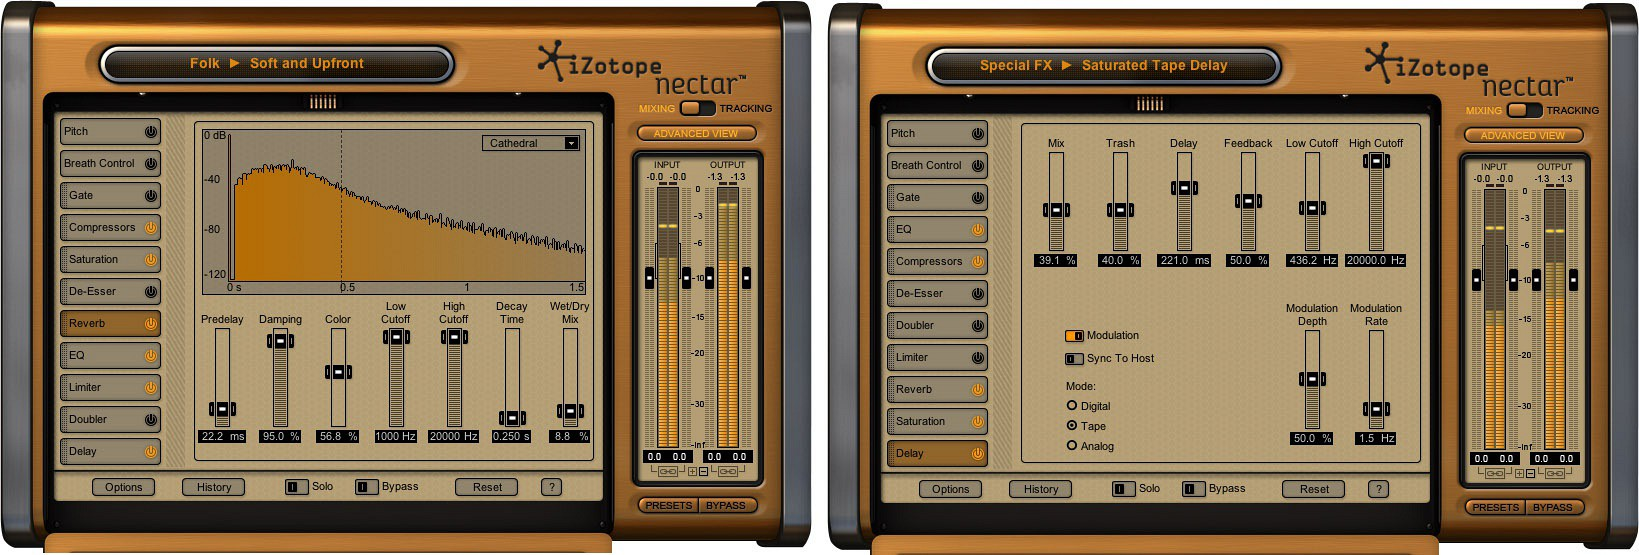 Nectar vst download | Download iZotope Nectar 3 Crack Mac